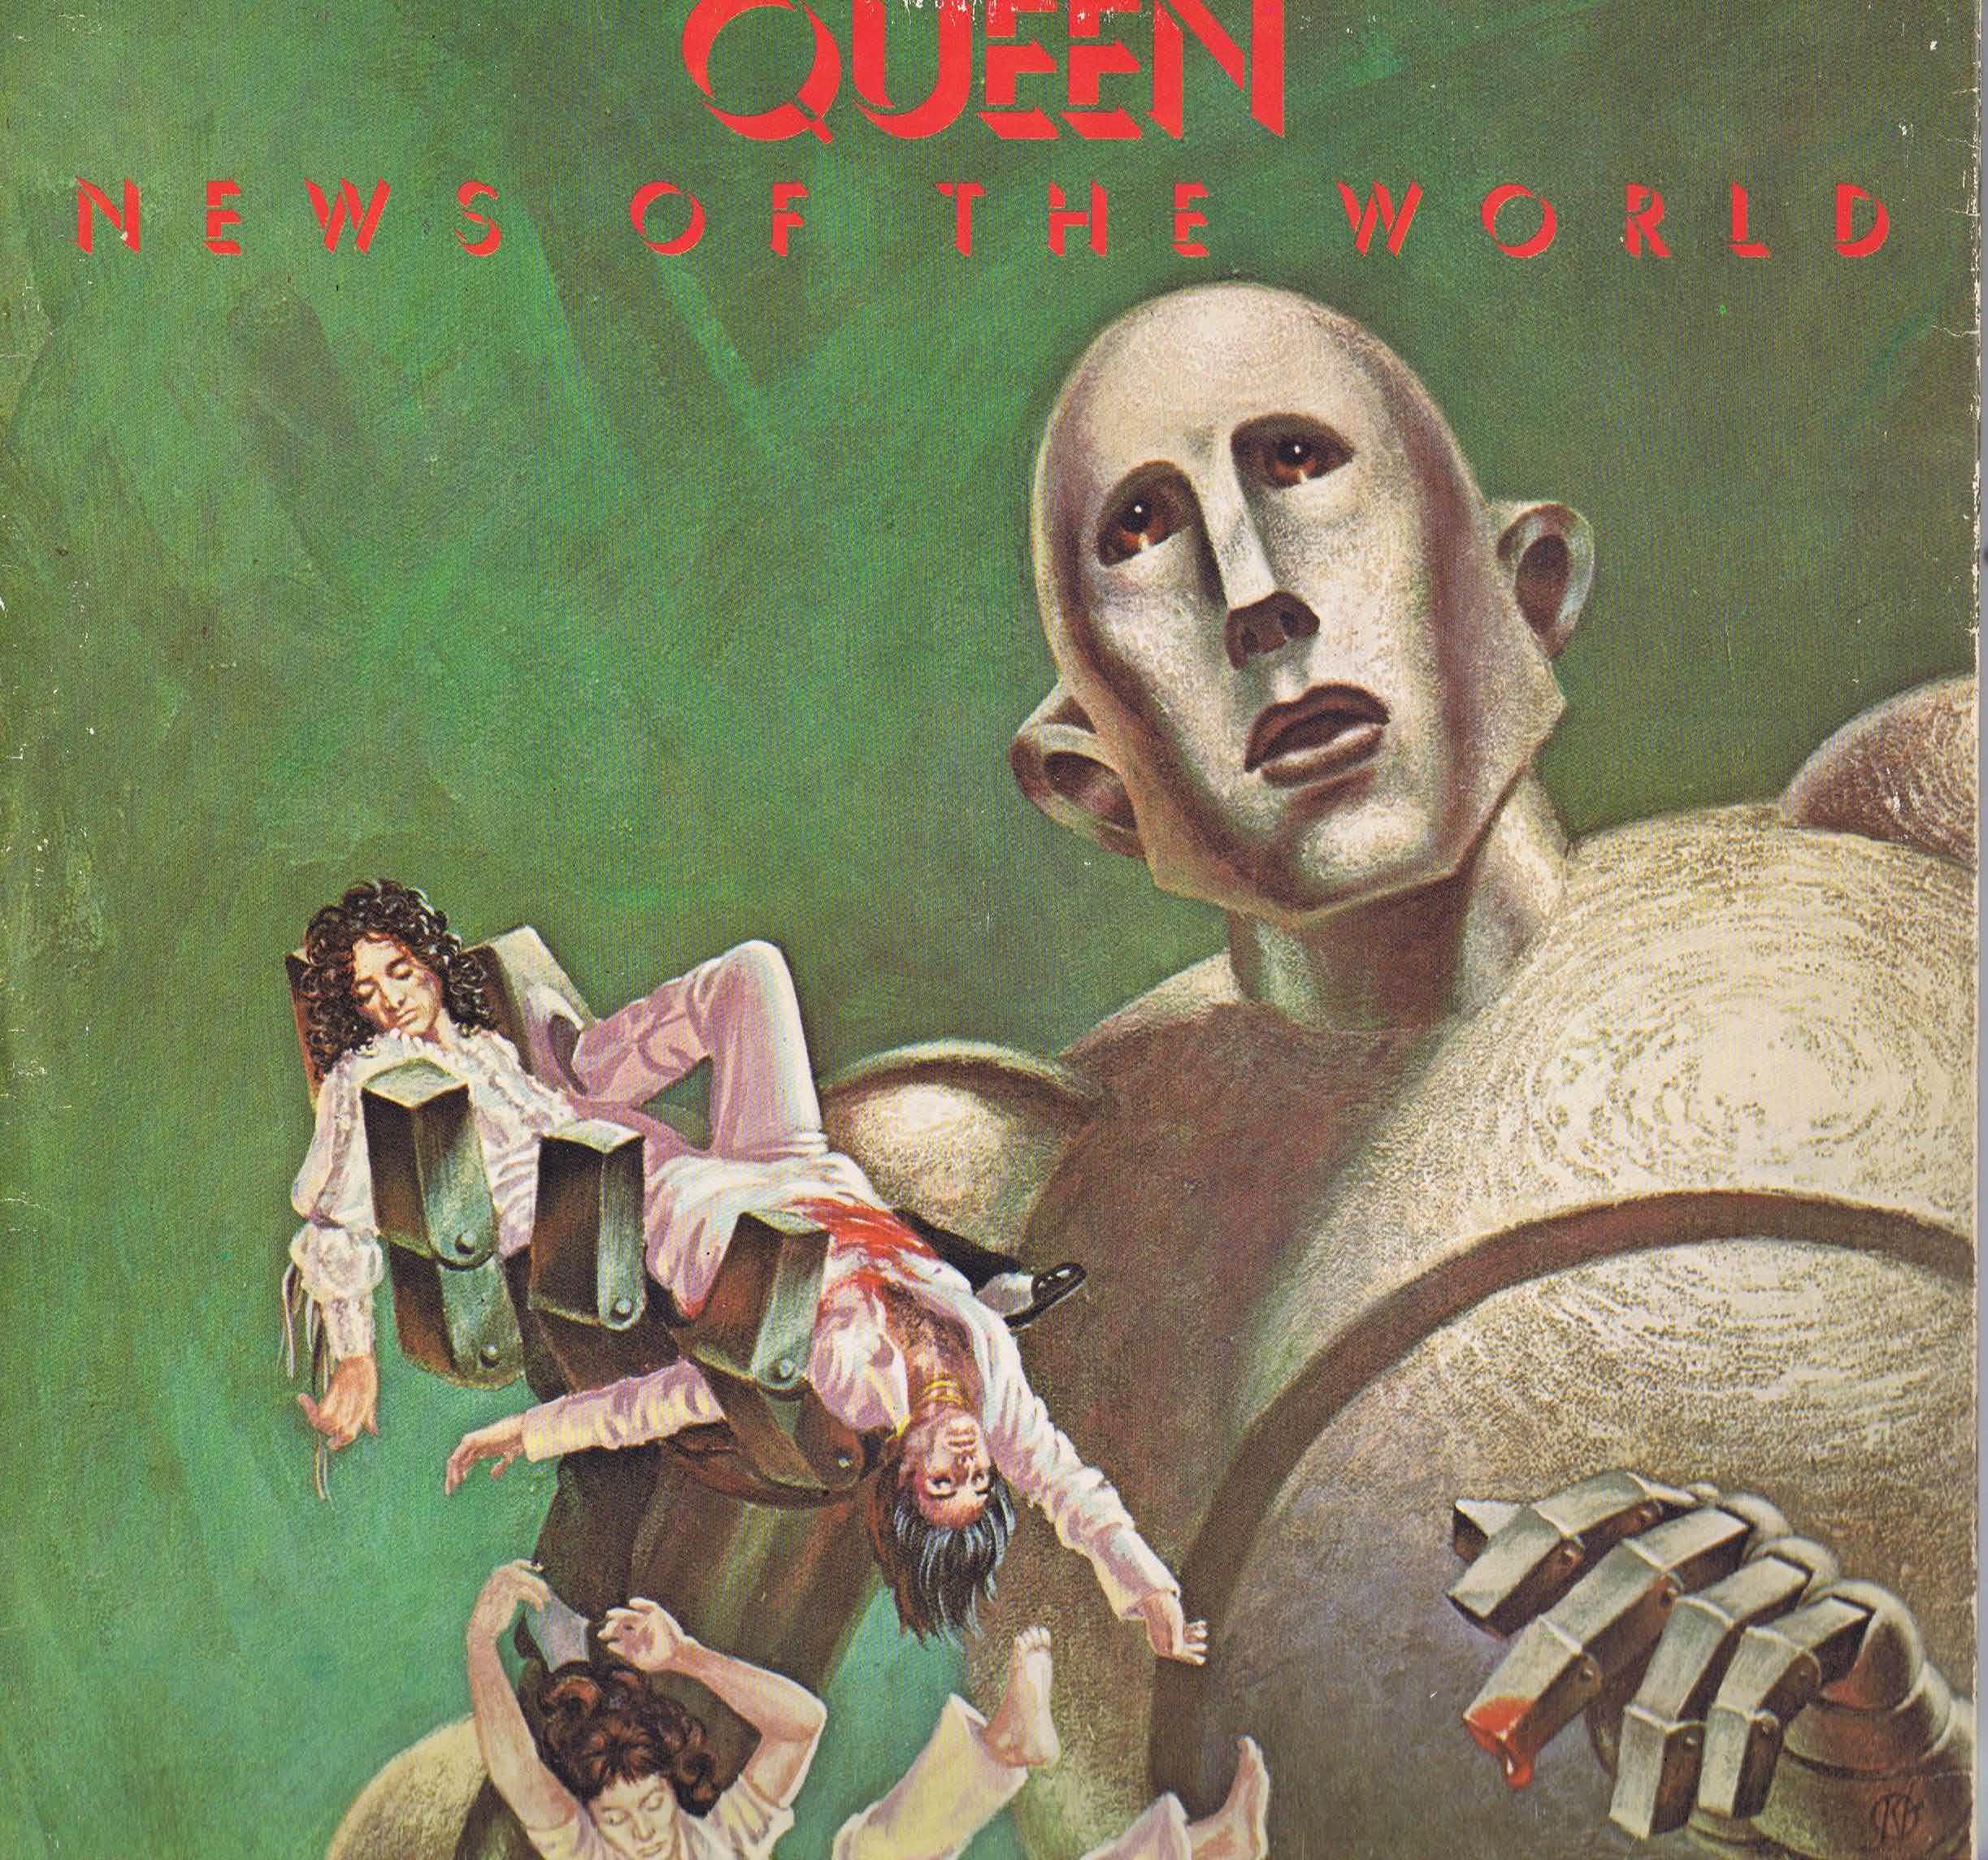 Queen News Of The World Ema 784 Lp Vinyl Record